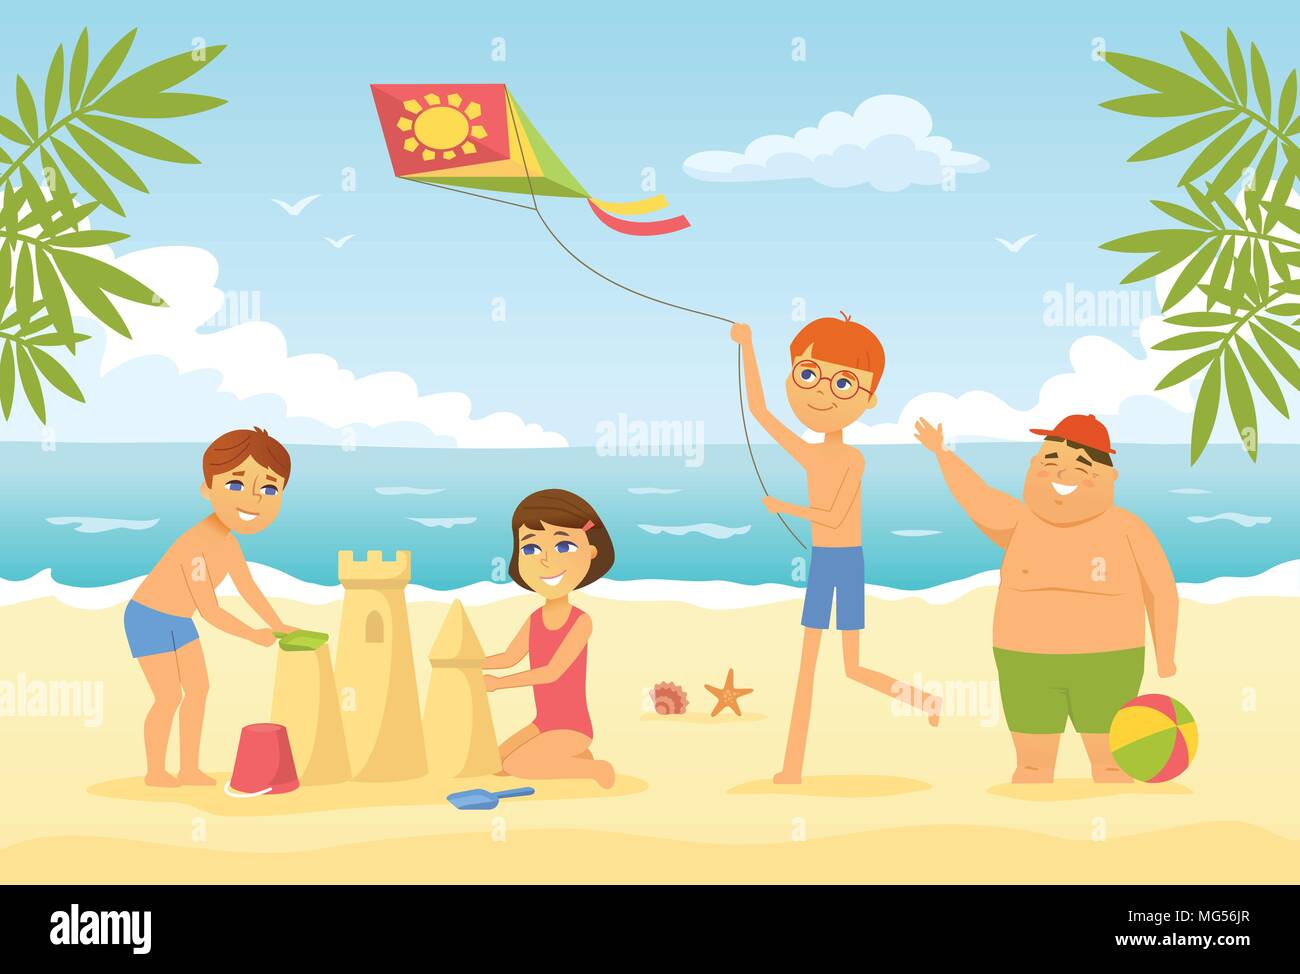 Happy Children On The Beach Cartoon People Character Illustration Stock Vector Image Art Alamy